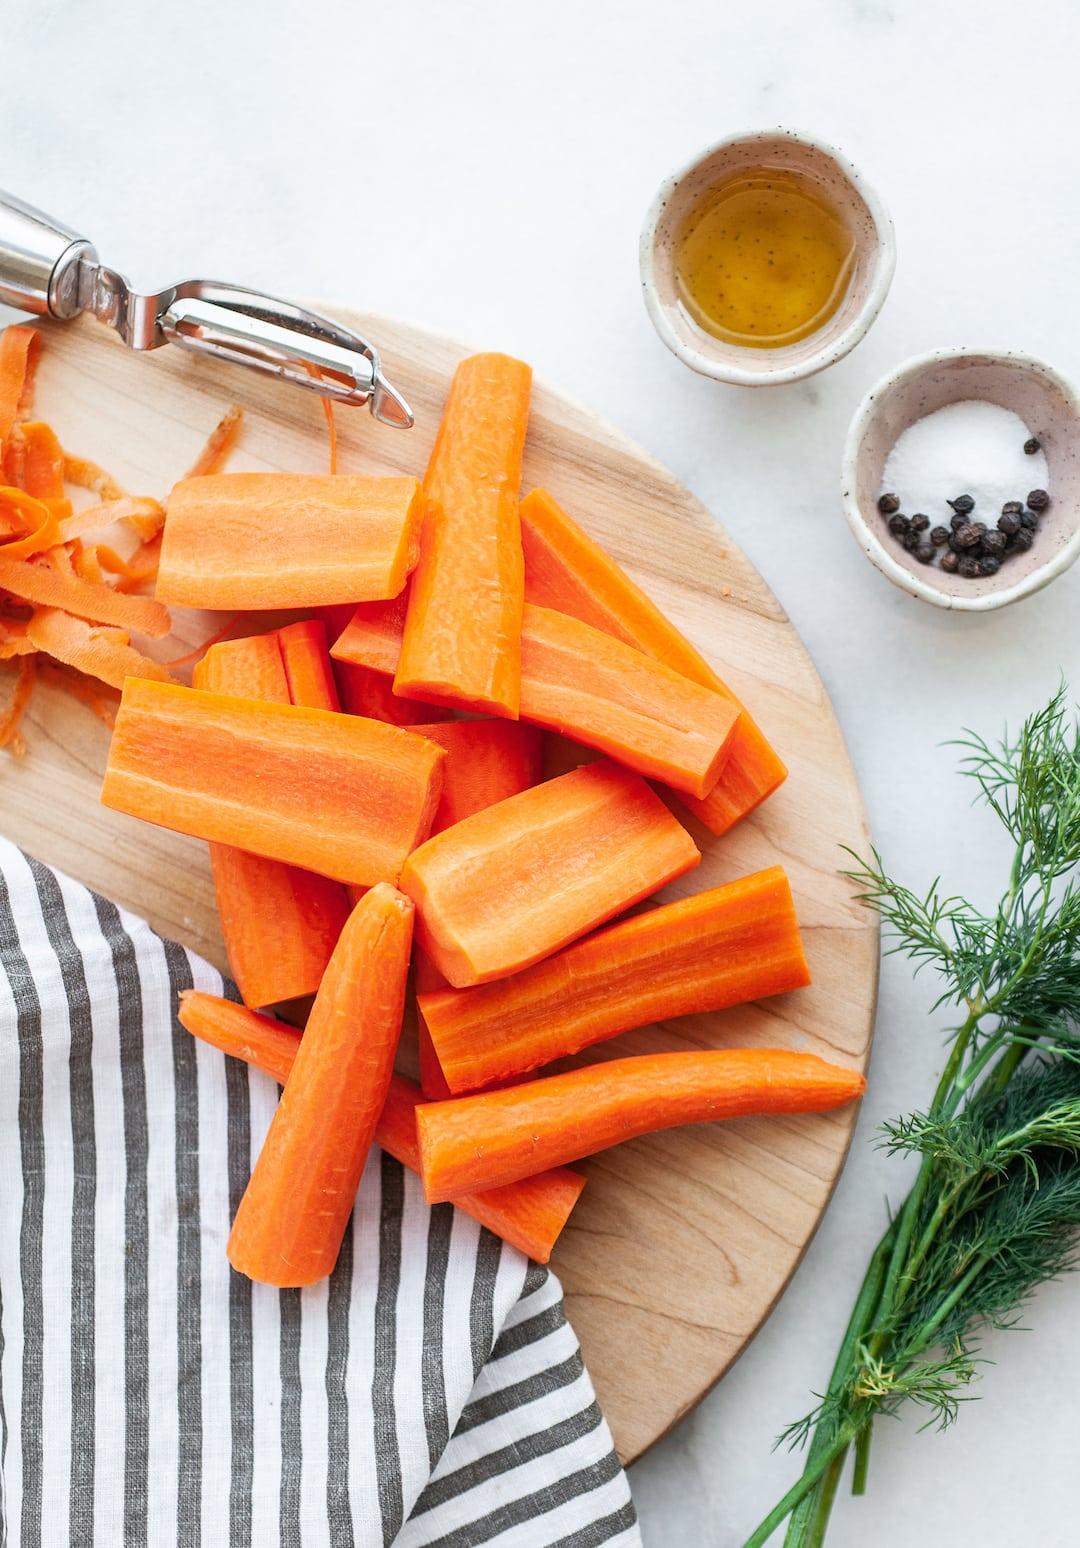 Ingredients for Incredible Air Fryer Carrots